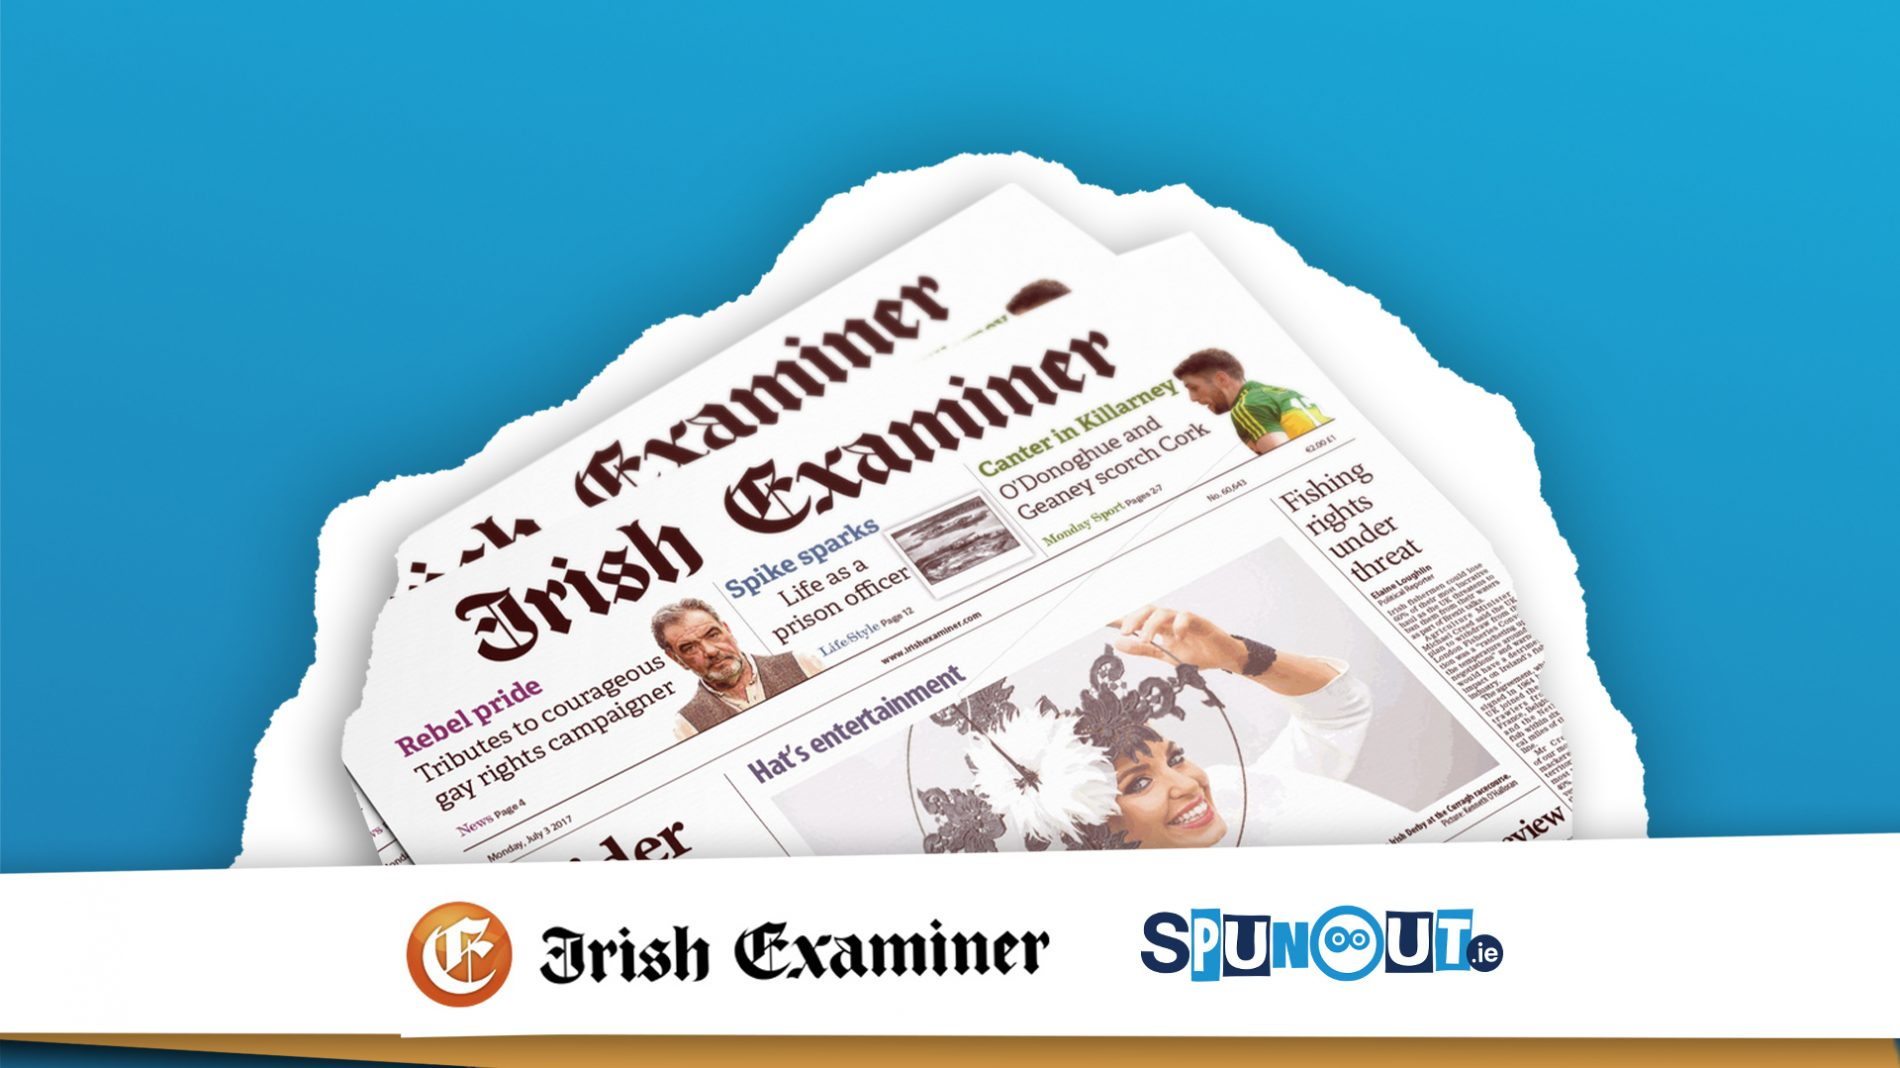 Irish-Examiner-Survey-Article-Cover